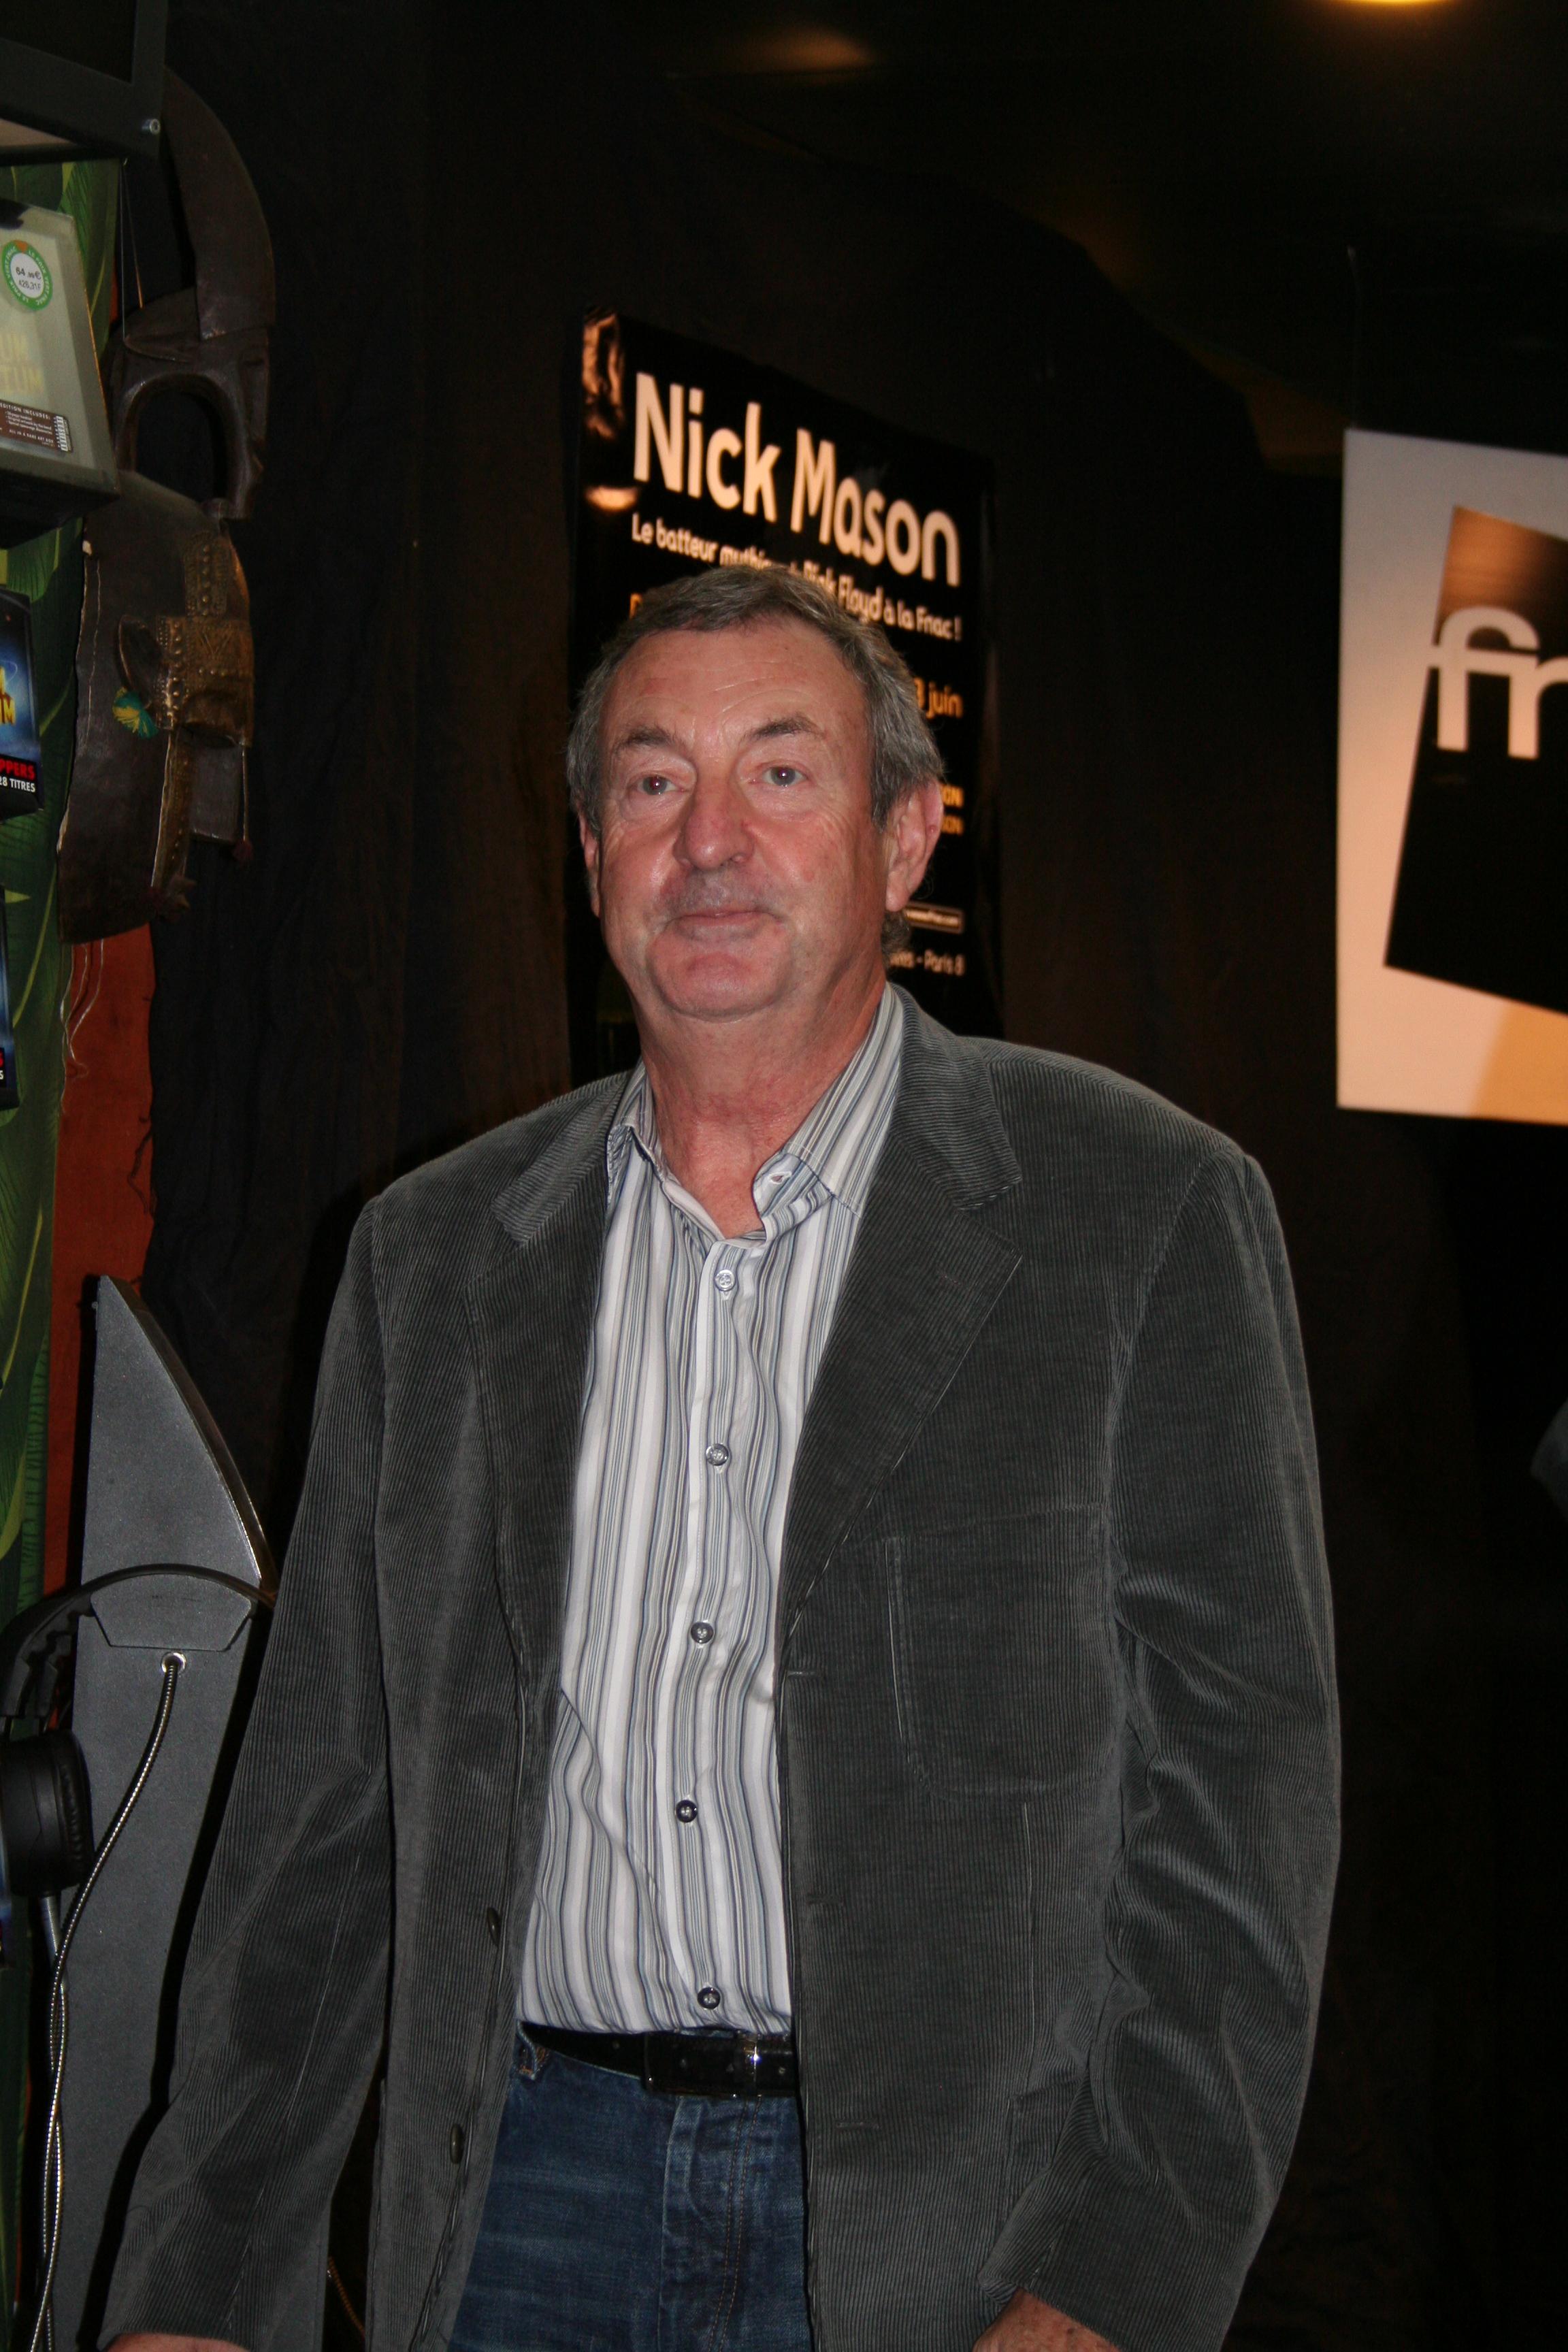 Depiction of Nick Mason